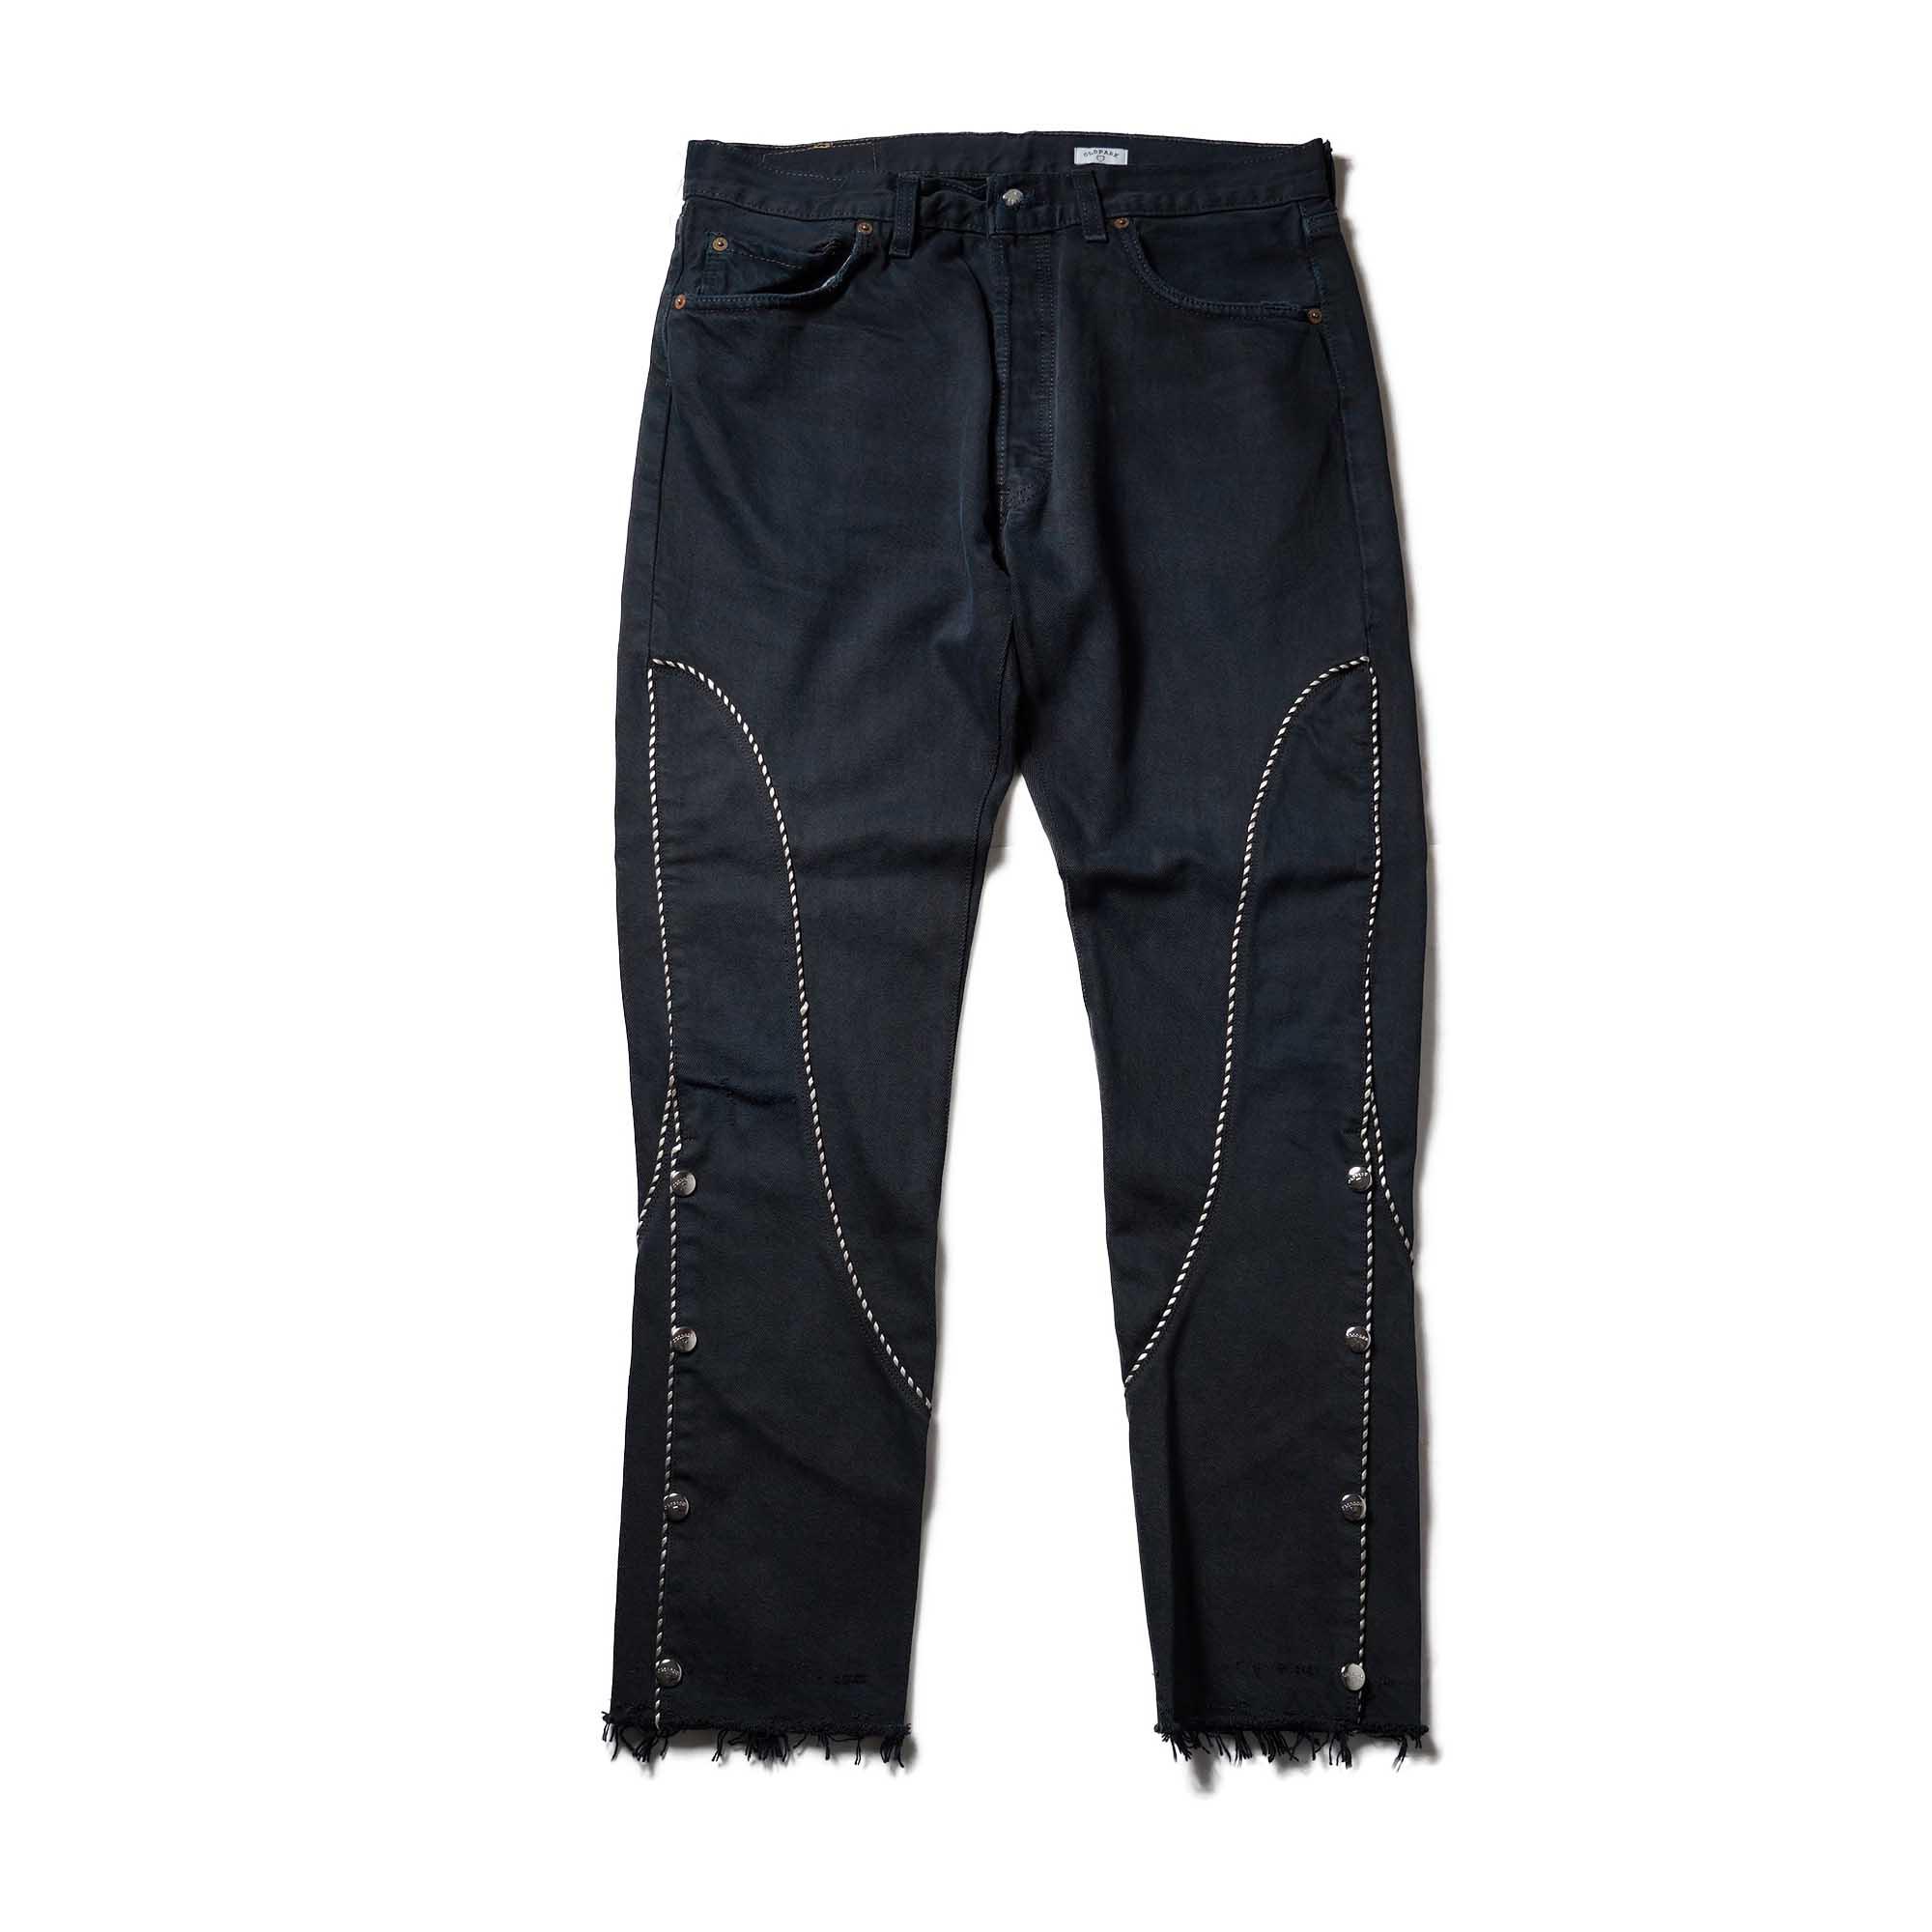 OLD PARK / Western Jeans2 Black (Lsize-A)正面